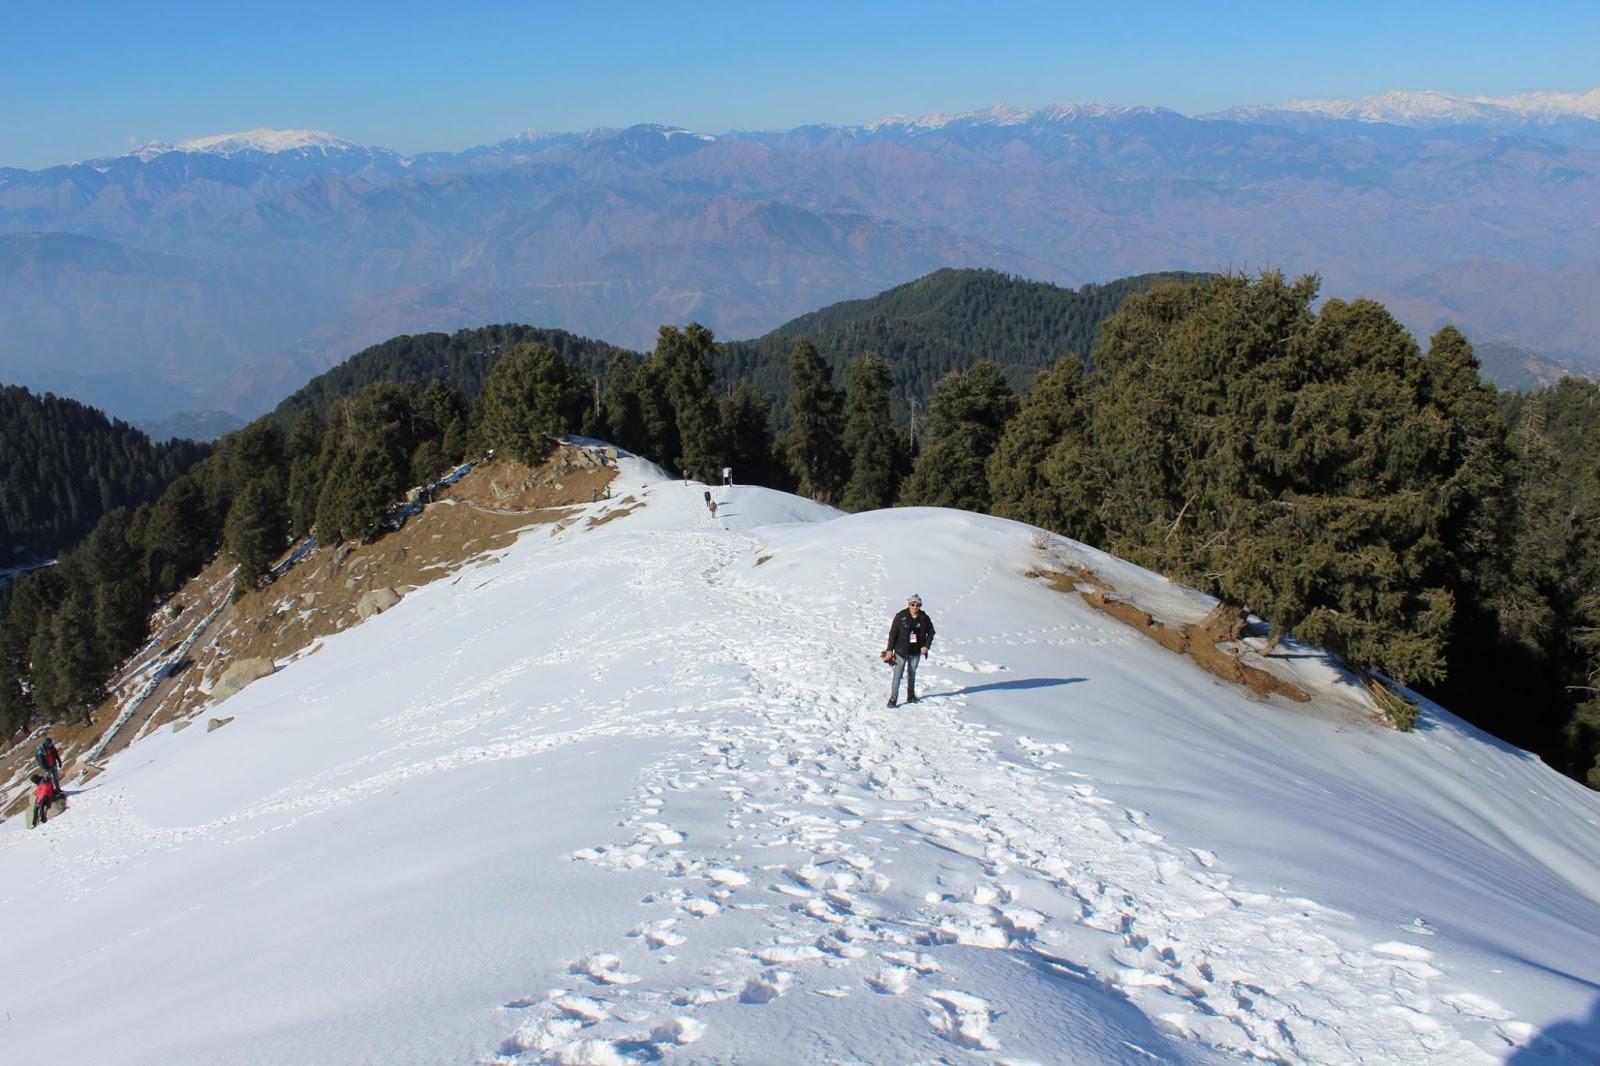 Dalhousie - Beautiful Hill Station of Himachal Pradesh | India Tourism